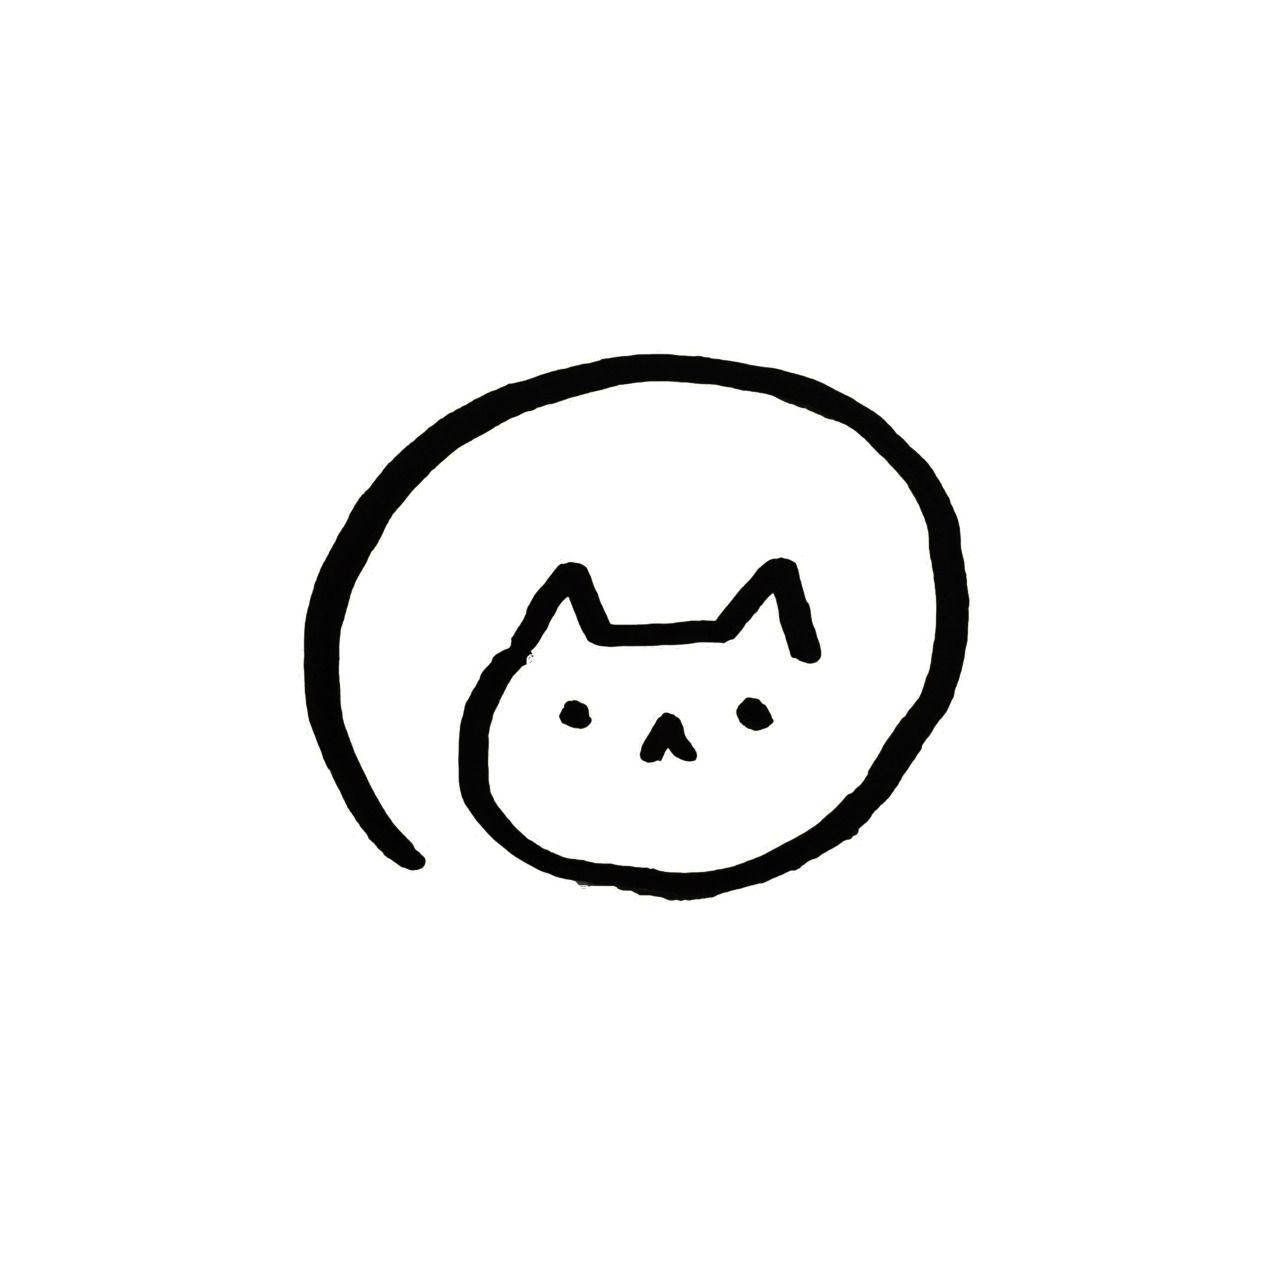 Cat Illustration Tumblr Cute Easy Animal Drawings Easy Animal Drawings Mini Drawings